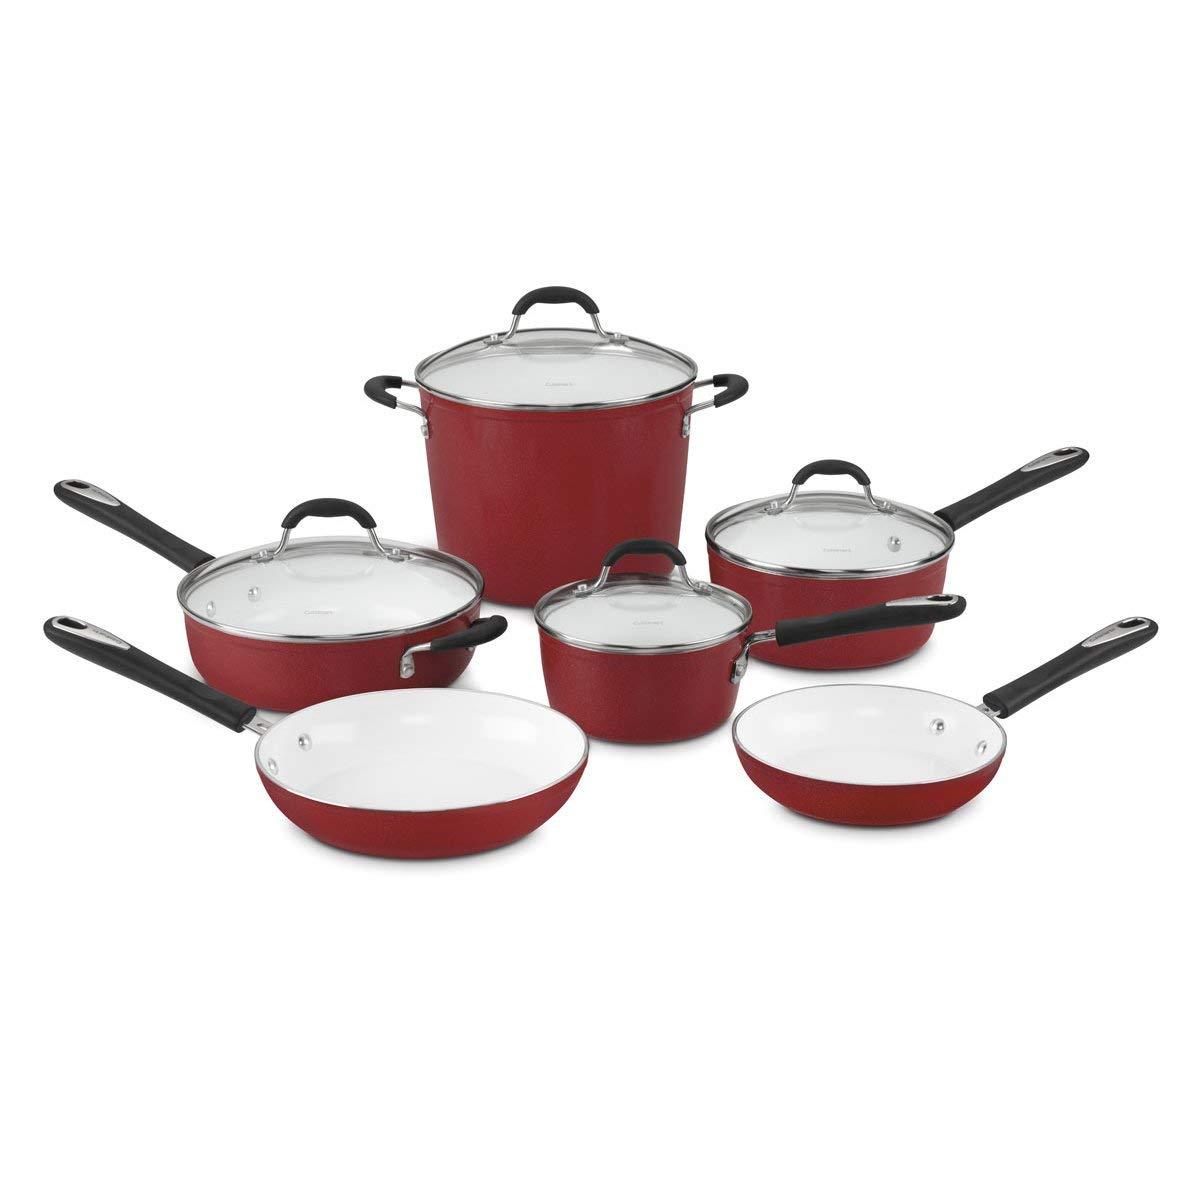 Cuisinart Ceramic Cookware Reviews